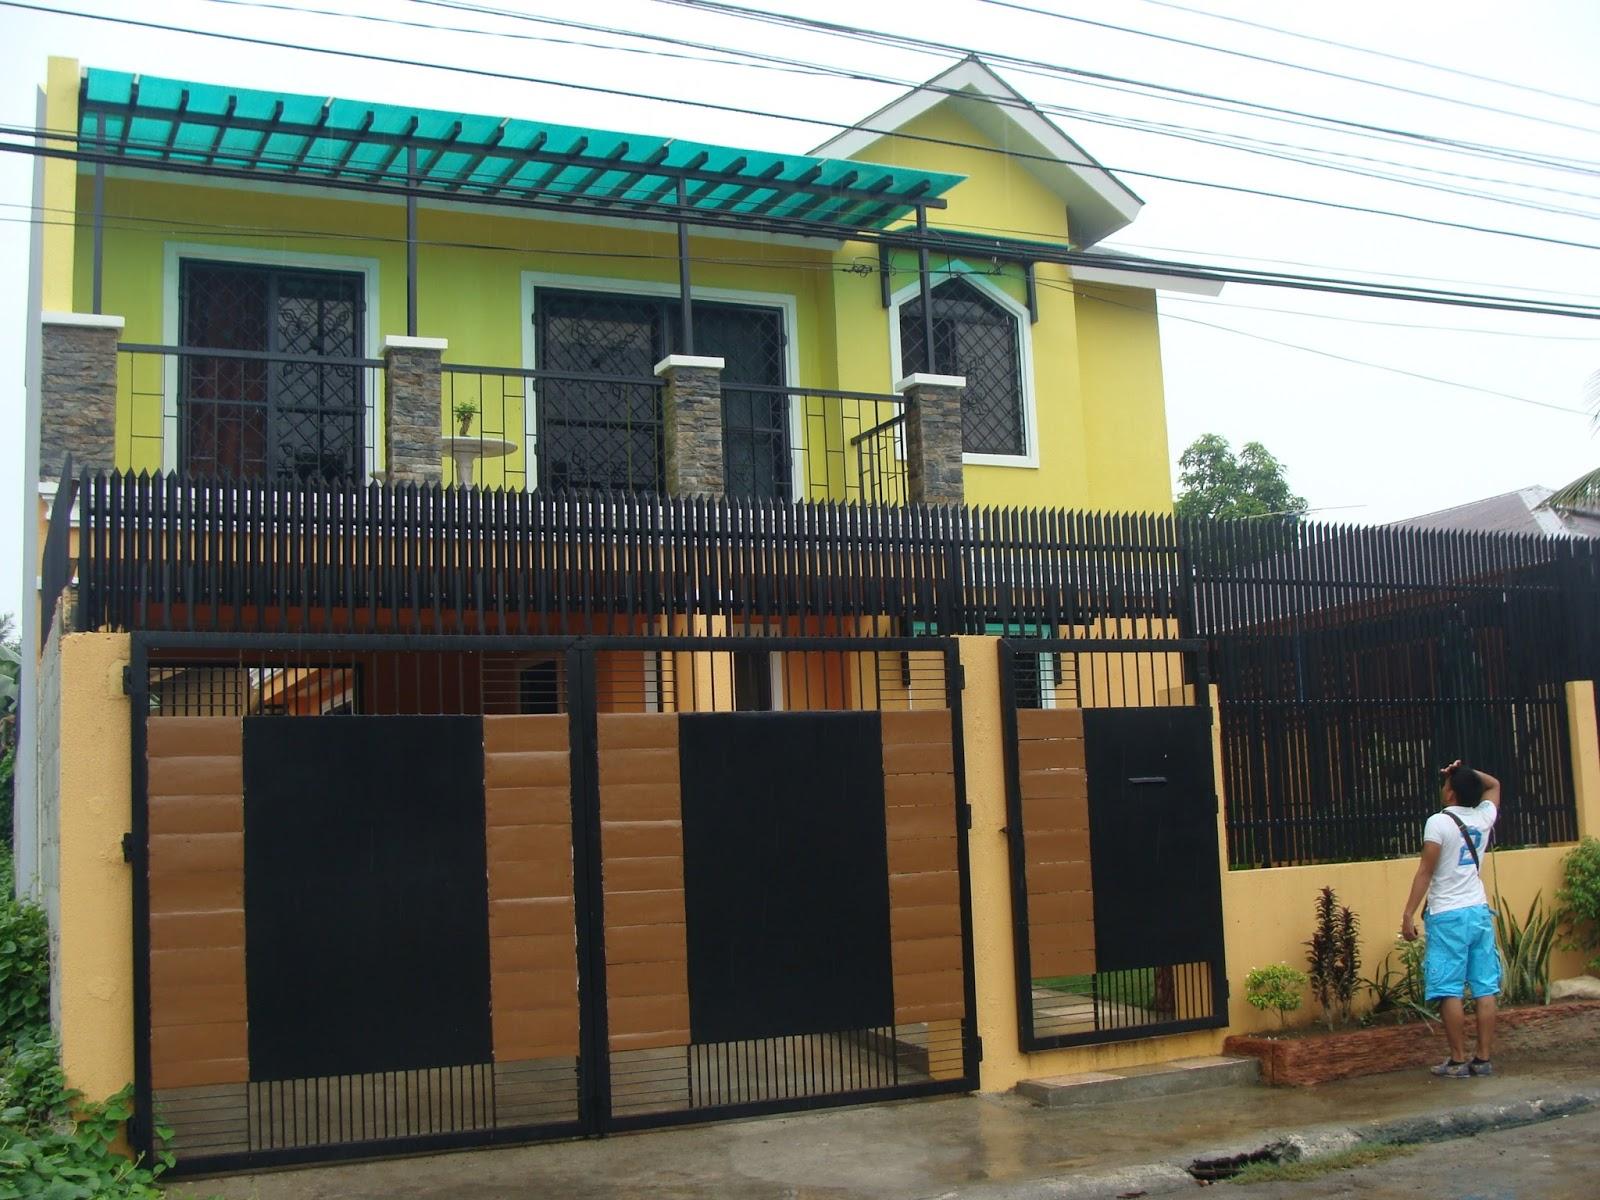 Iloilo two storey house designs philippines iloilo modern house